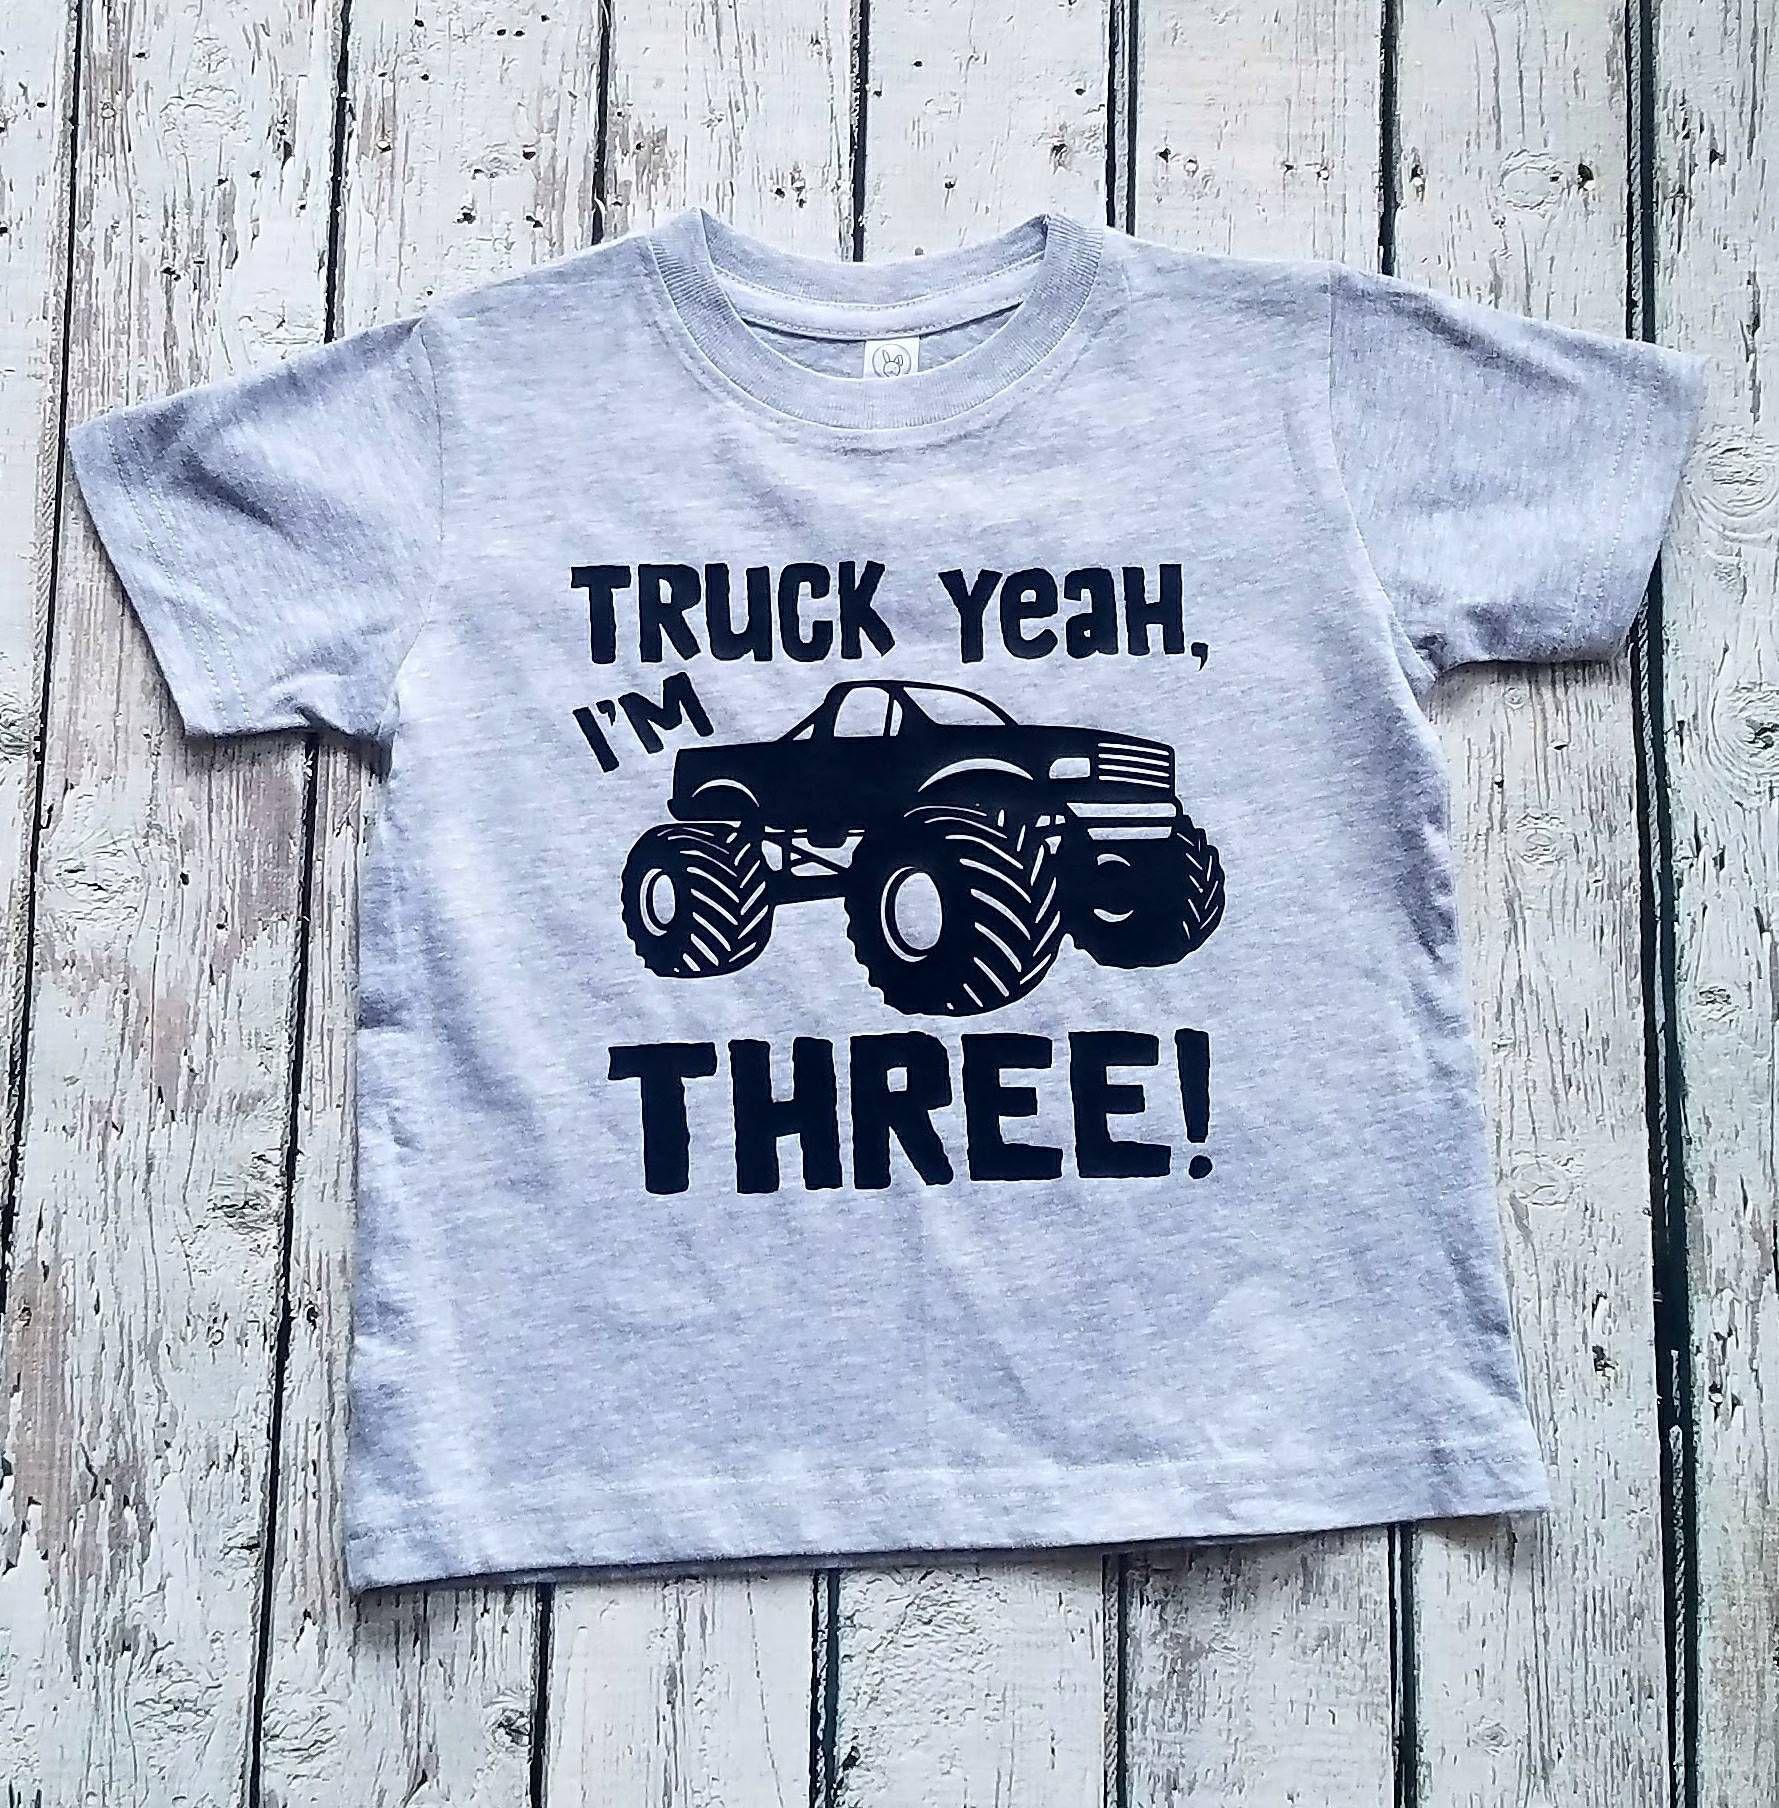 5ee6257c Monster truck shirt, Truck yeah I'm three boys girls unisex t shirt ...